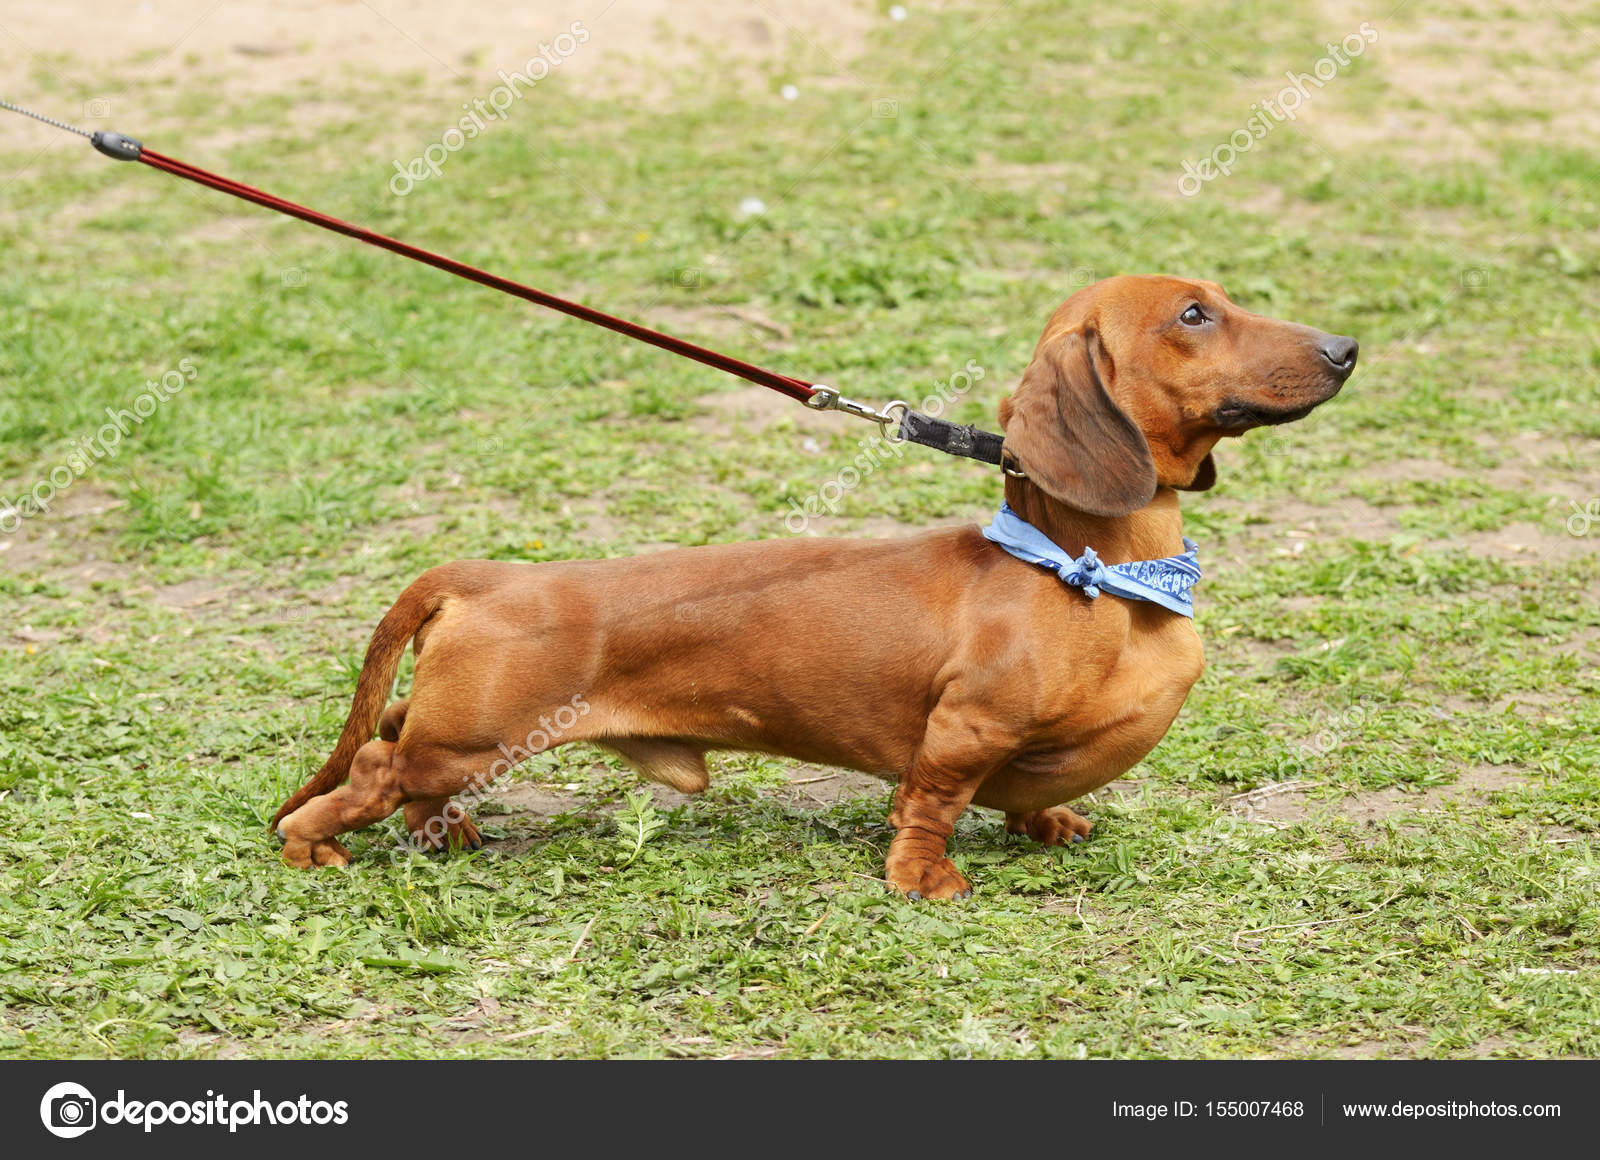 the dachshund is a hunting dog stock photo parasunak yandex ru